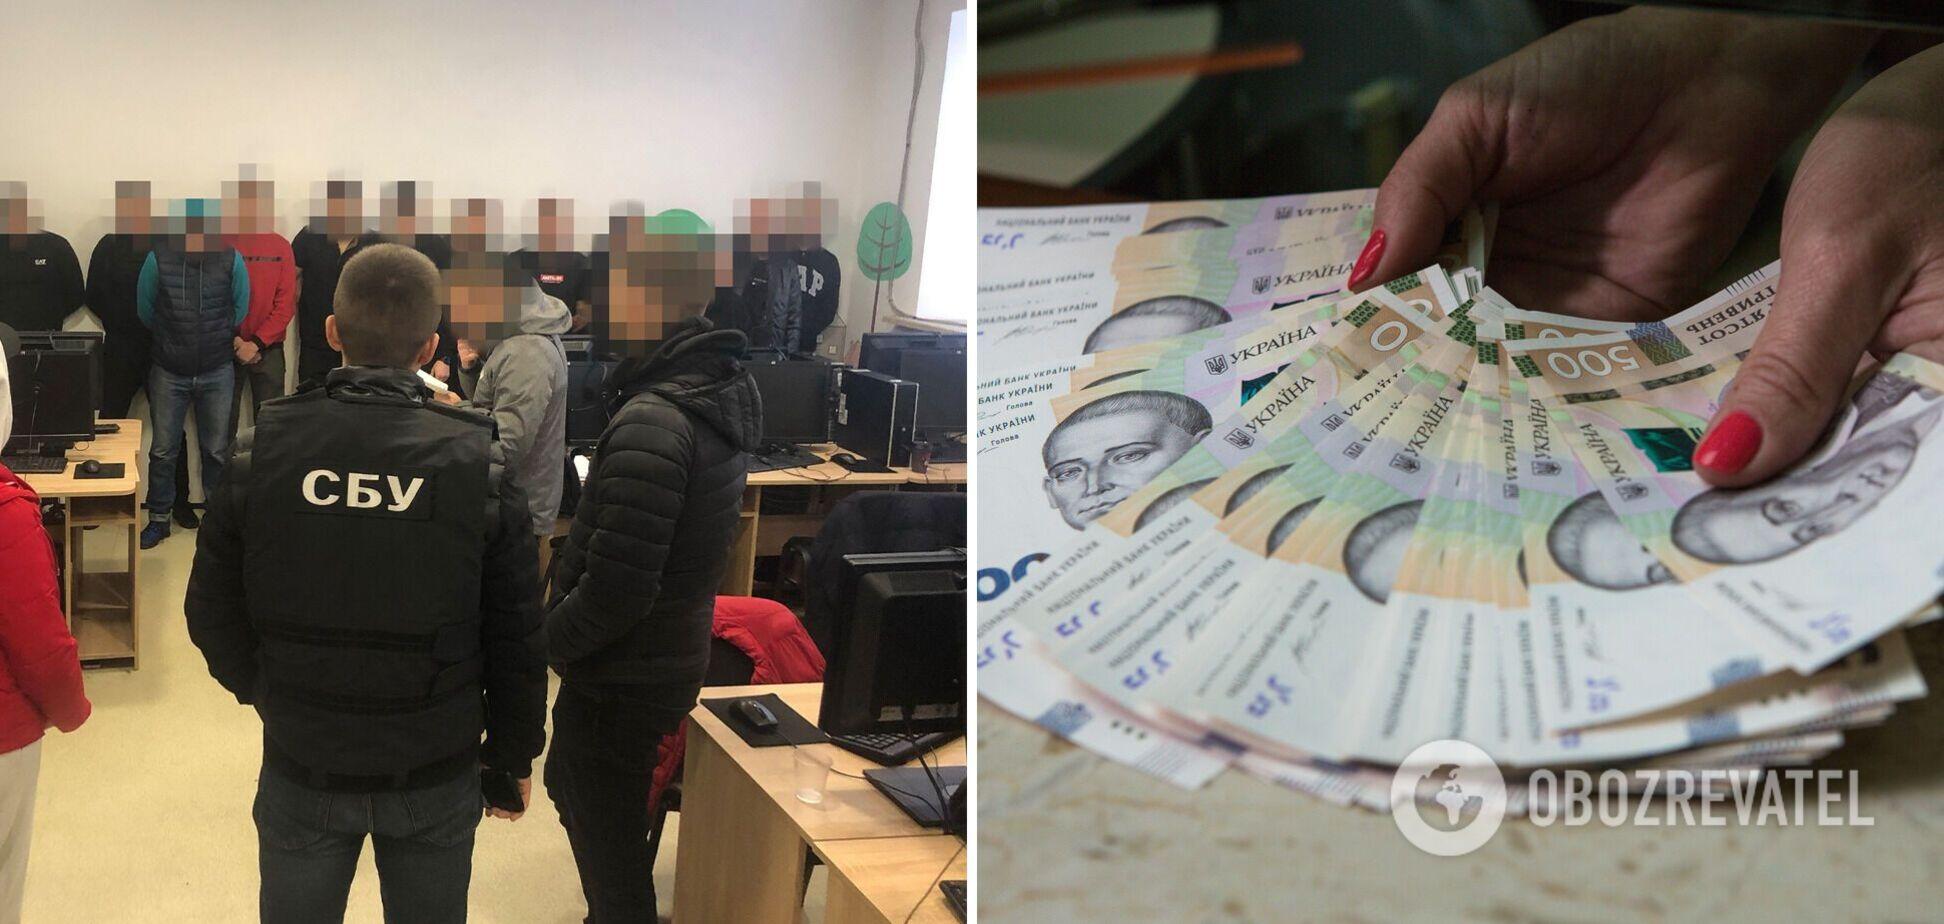 Прикидалися кол-центром: СБУ розкрила аферу на 6 млн гривень